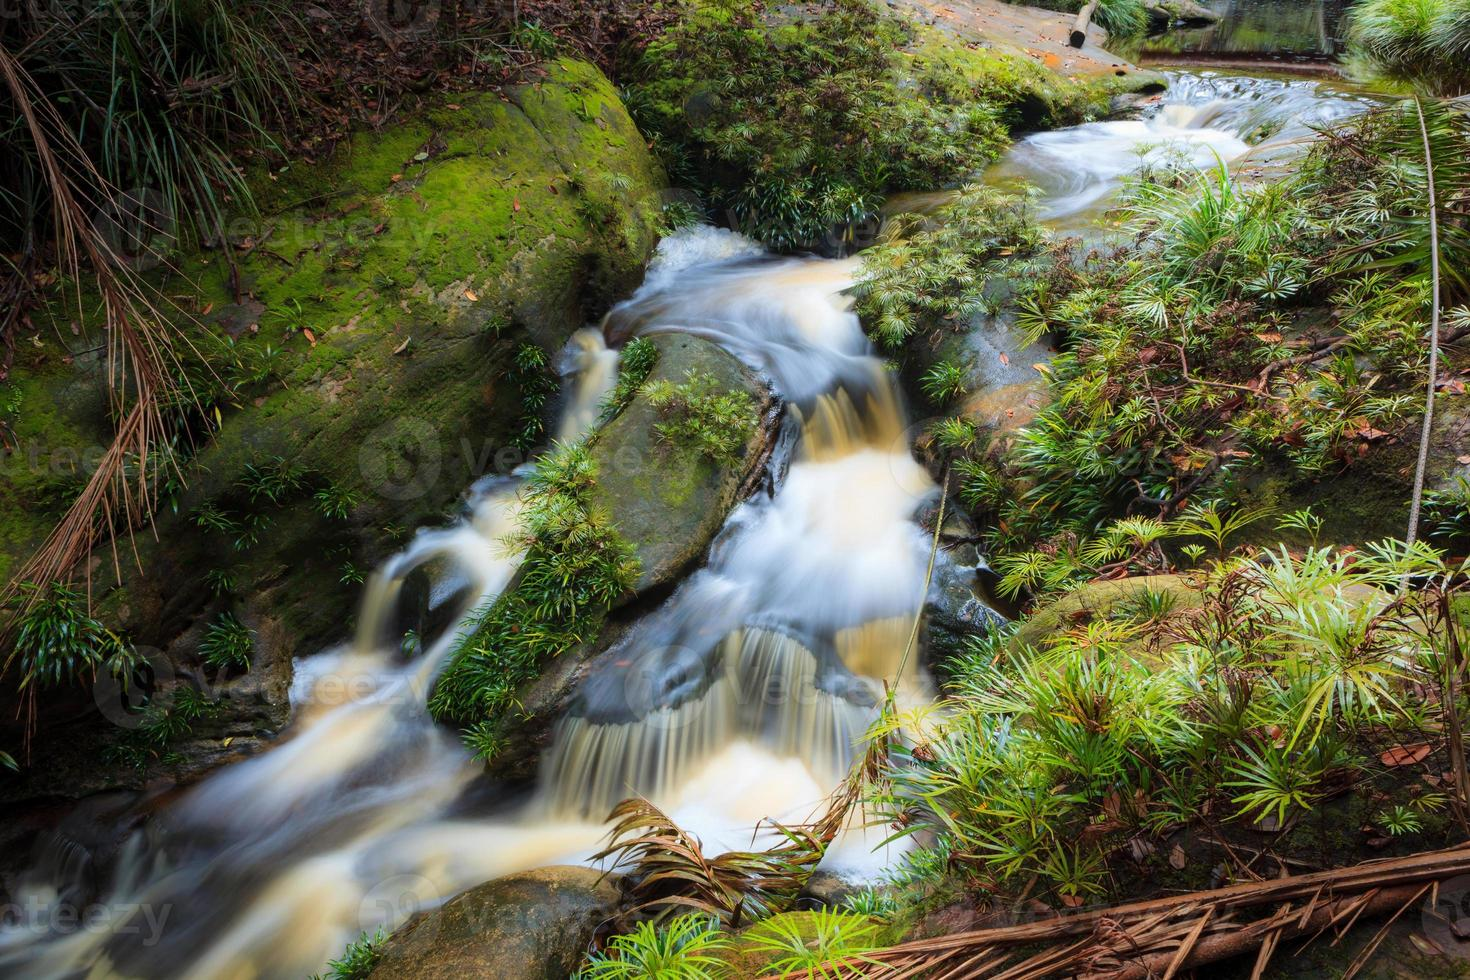 Small waterfall in jungle photo